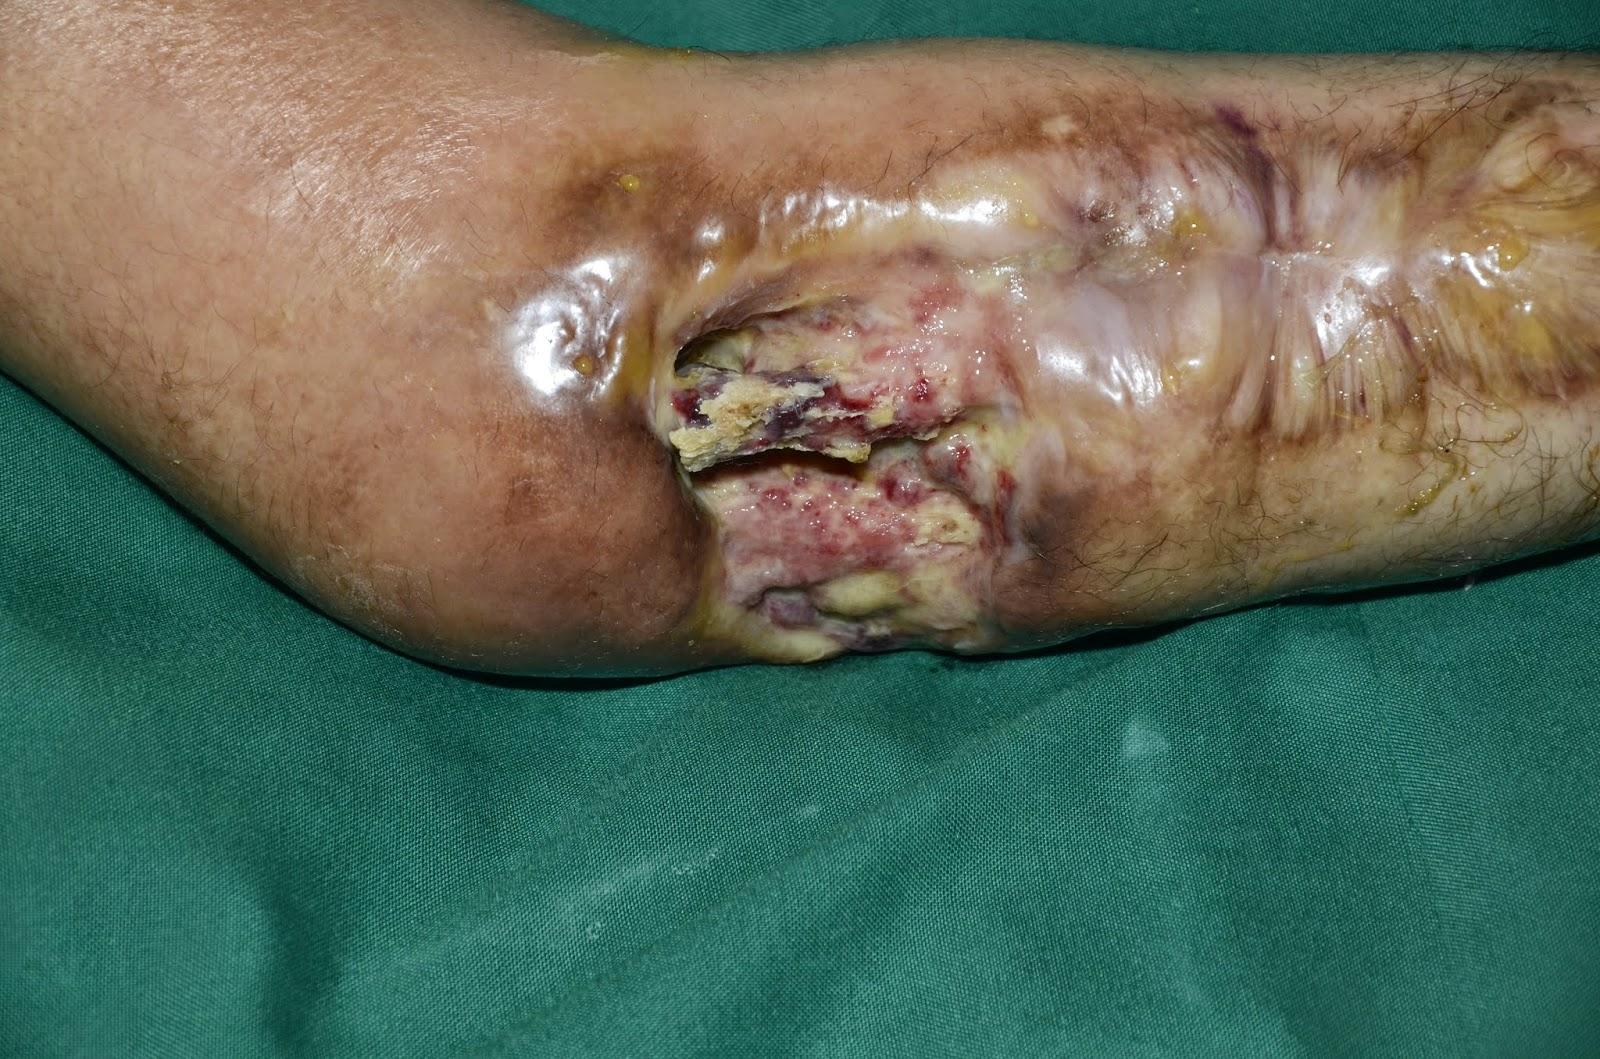 Active cellulitis with chronic osteomyelitis radius composite soft